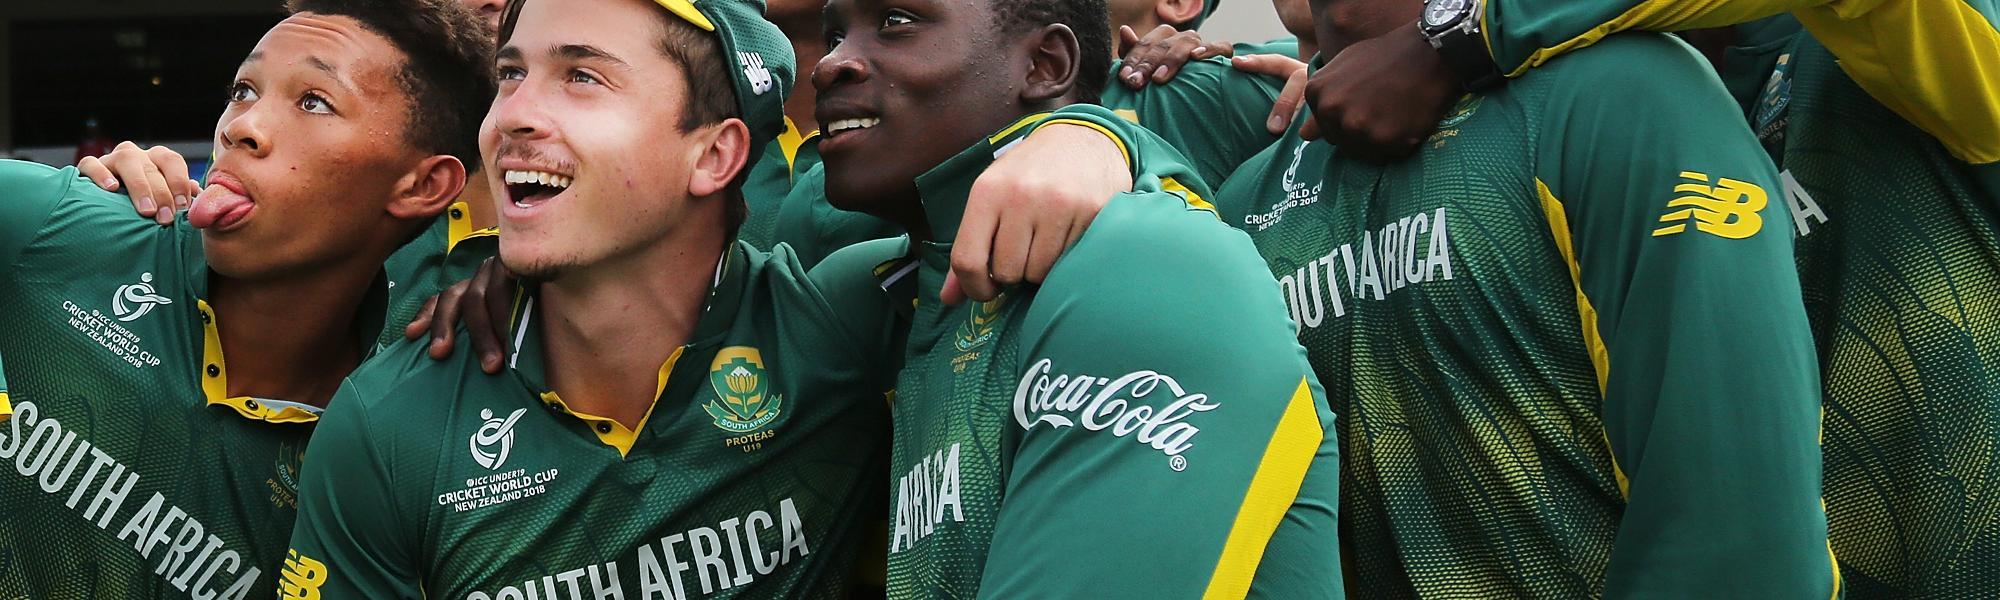 South Africa U19s